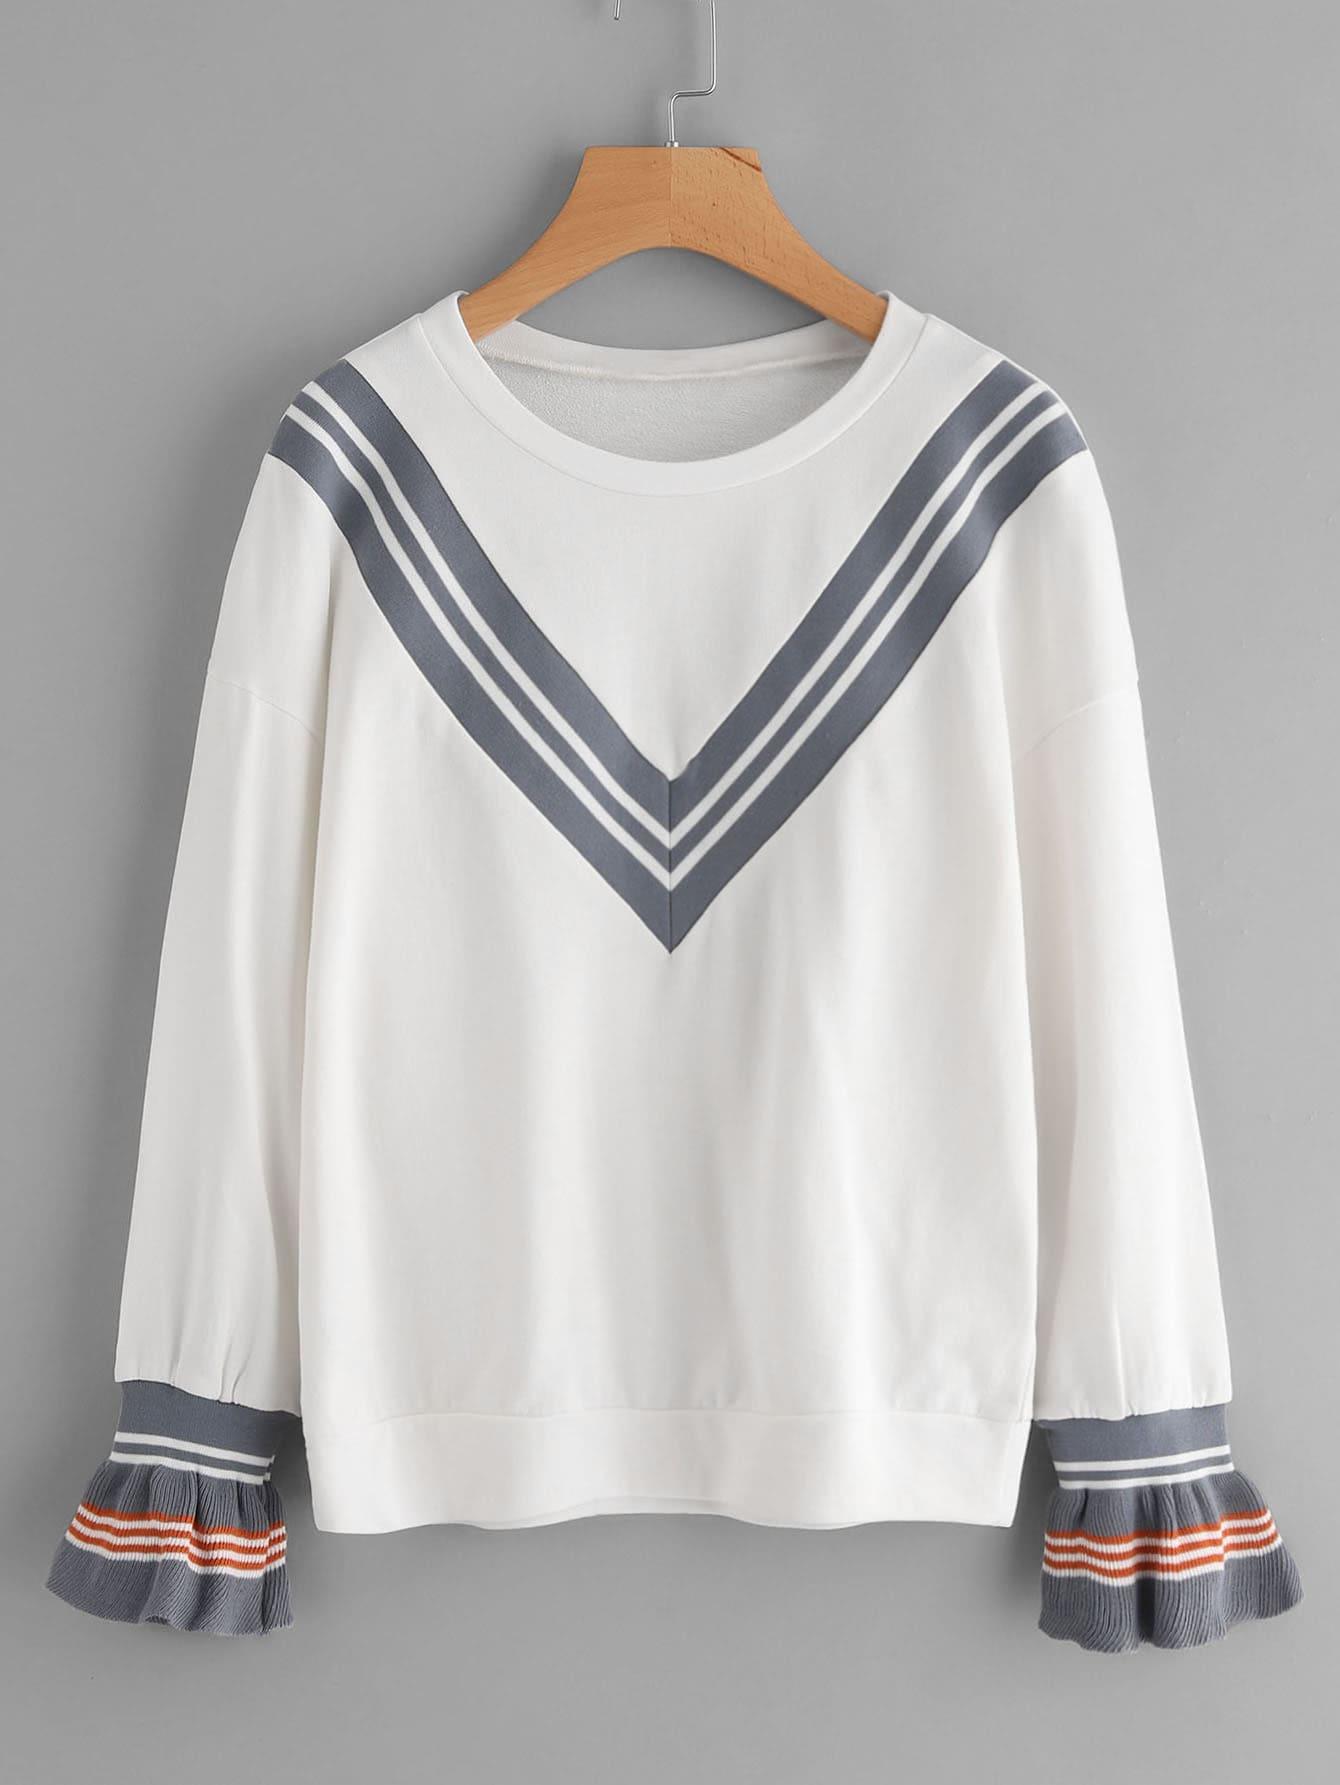 Striped Ribbed Ruffle Cuff Chevron Sweatshirt sweatshirt170901457